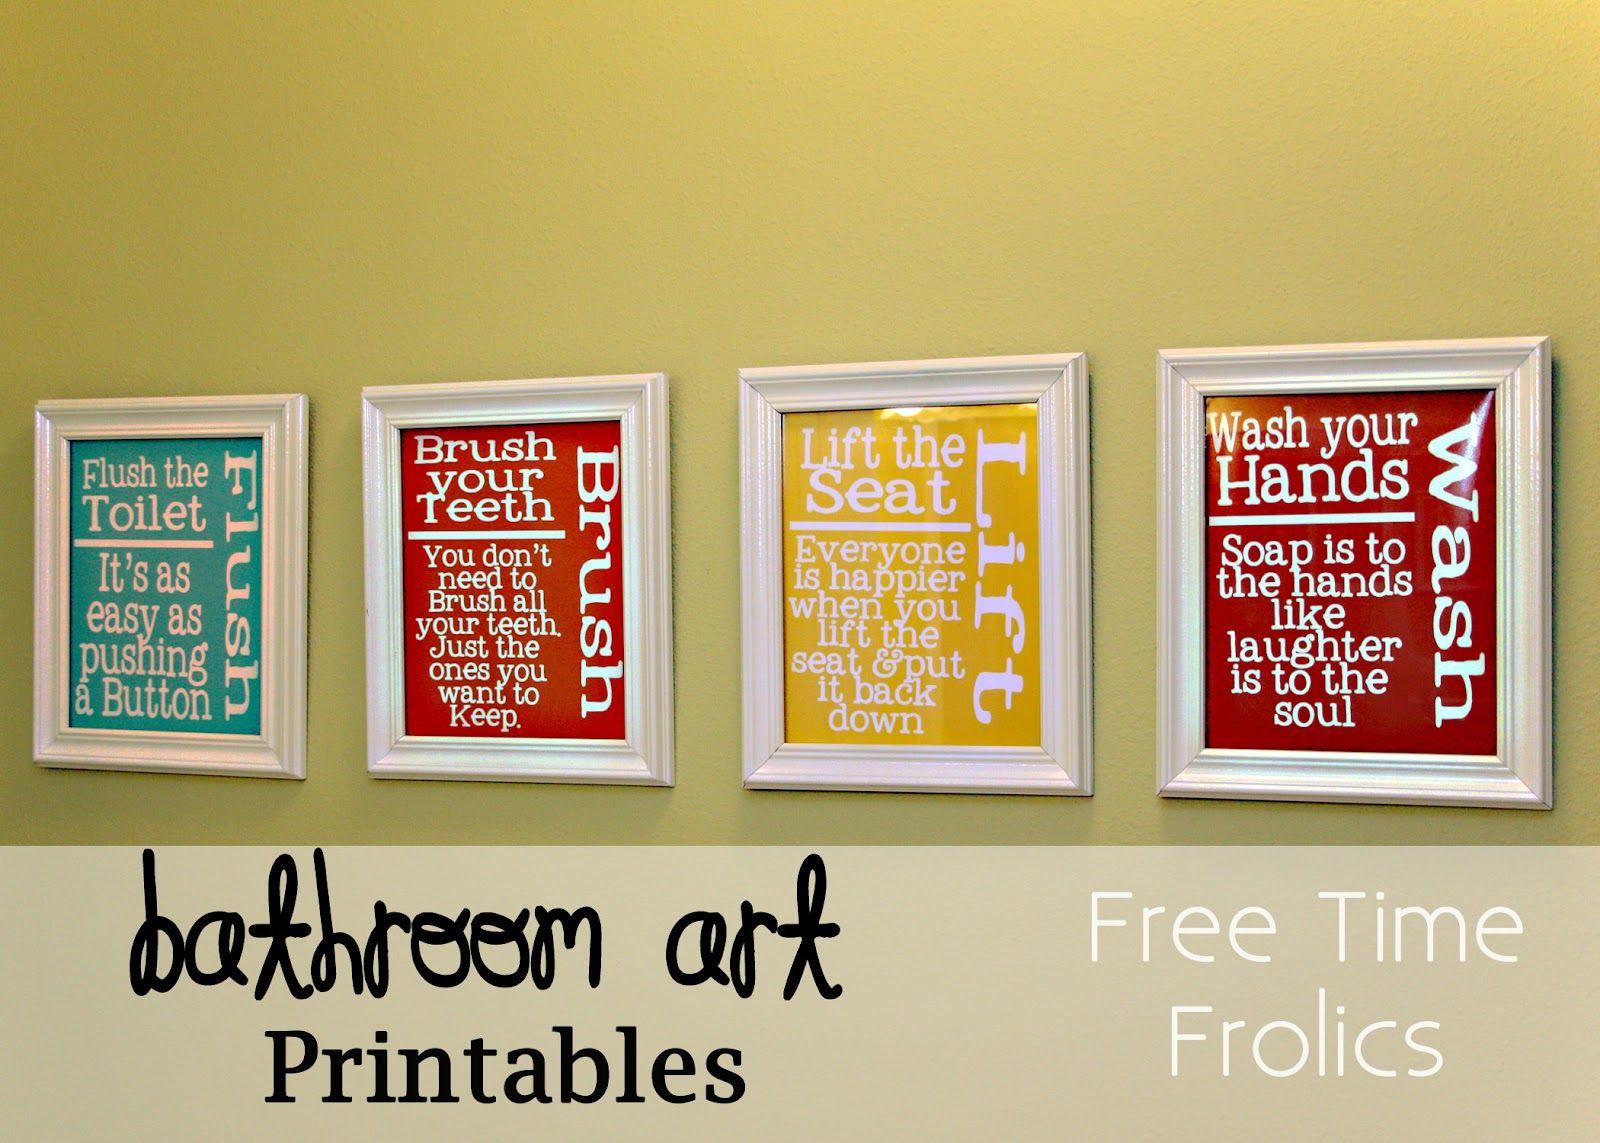 Free Bathroom {Art} Printable | Bathroom art, Free time and Free